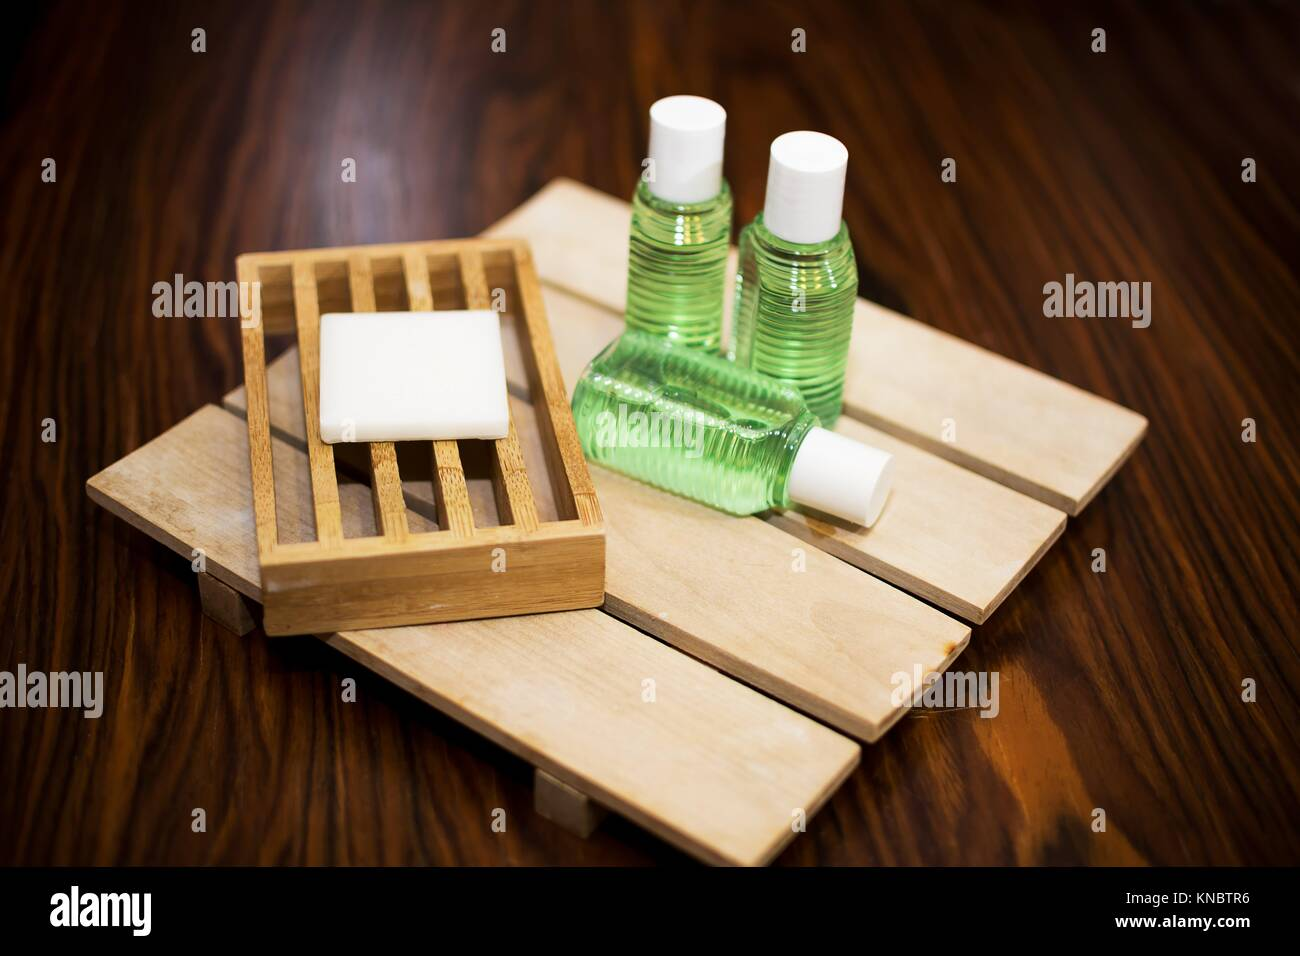 Hotel Bathroom Shampoo Soap Stock Photos & Hotel Bathroom ...